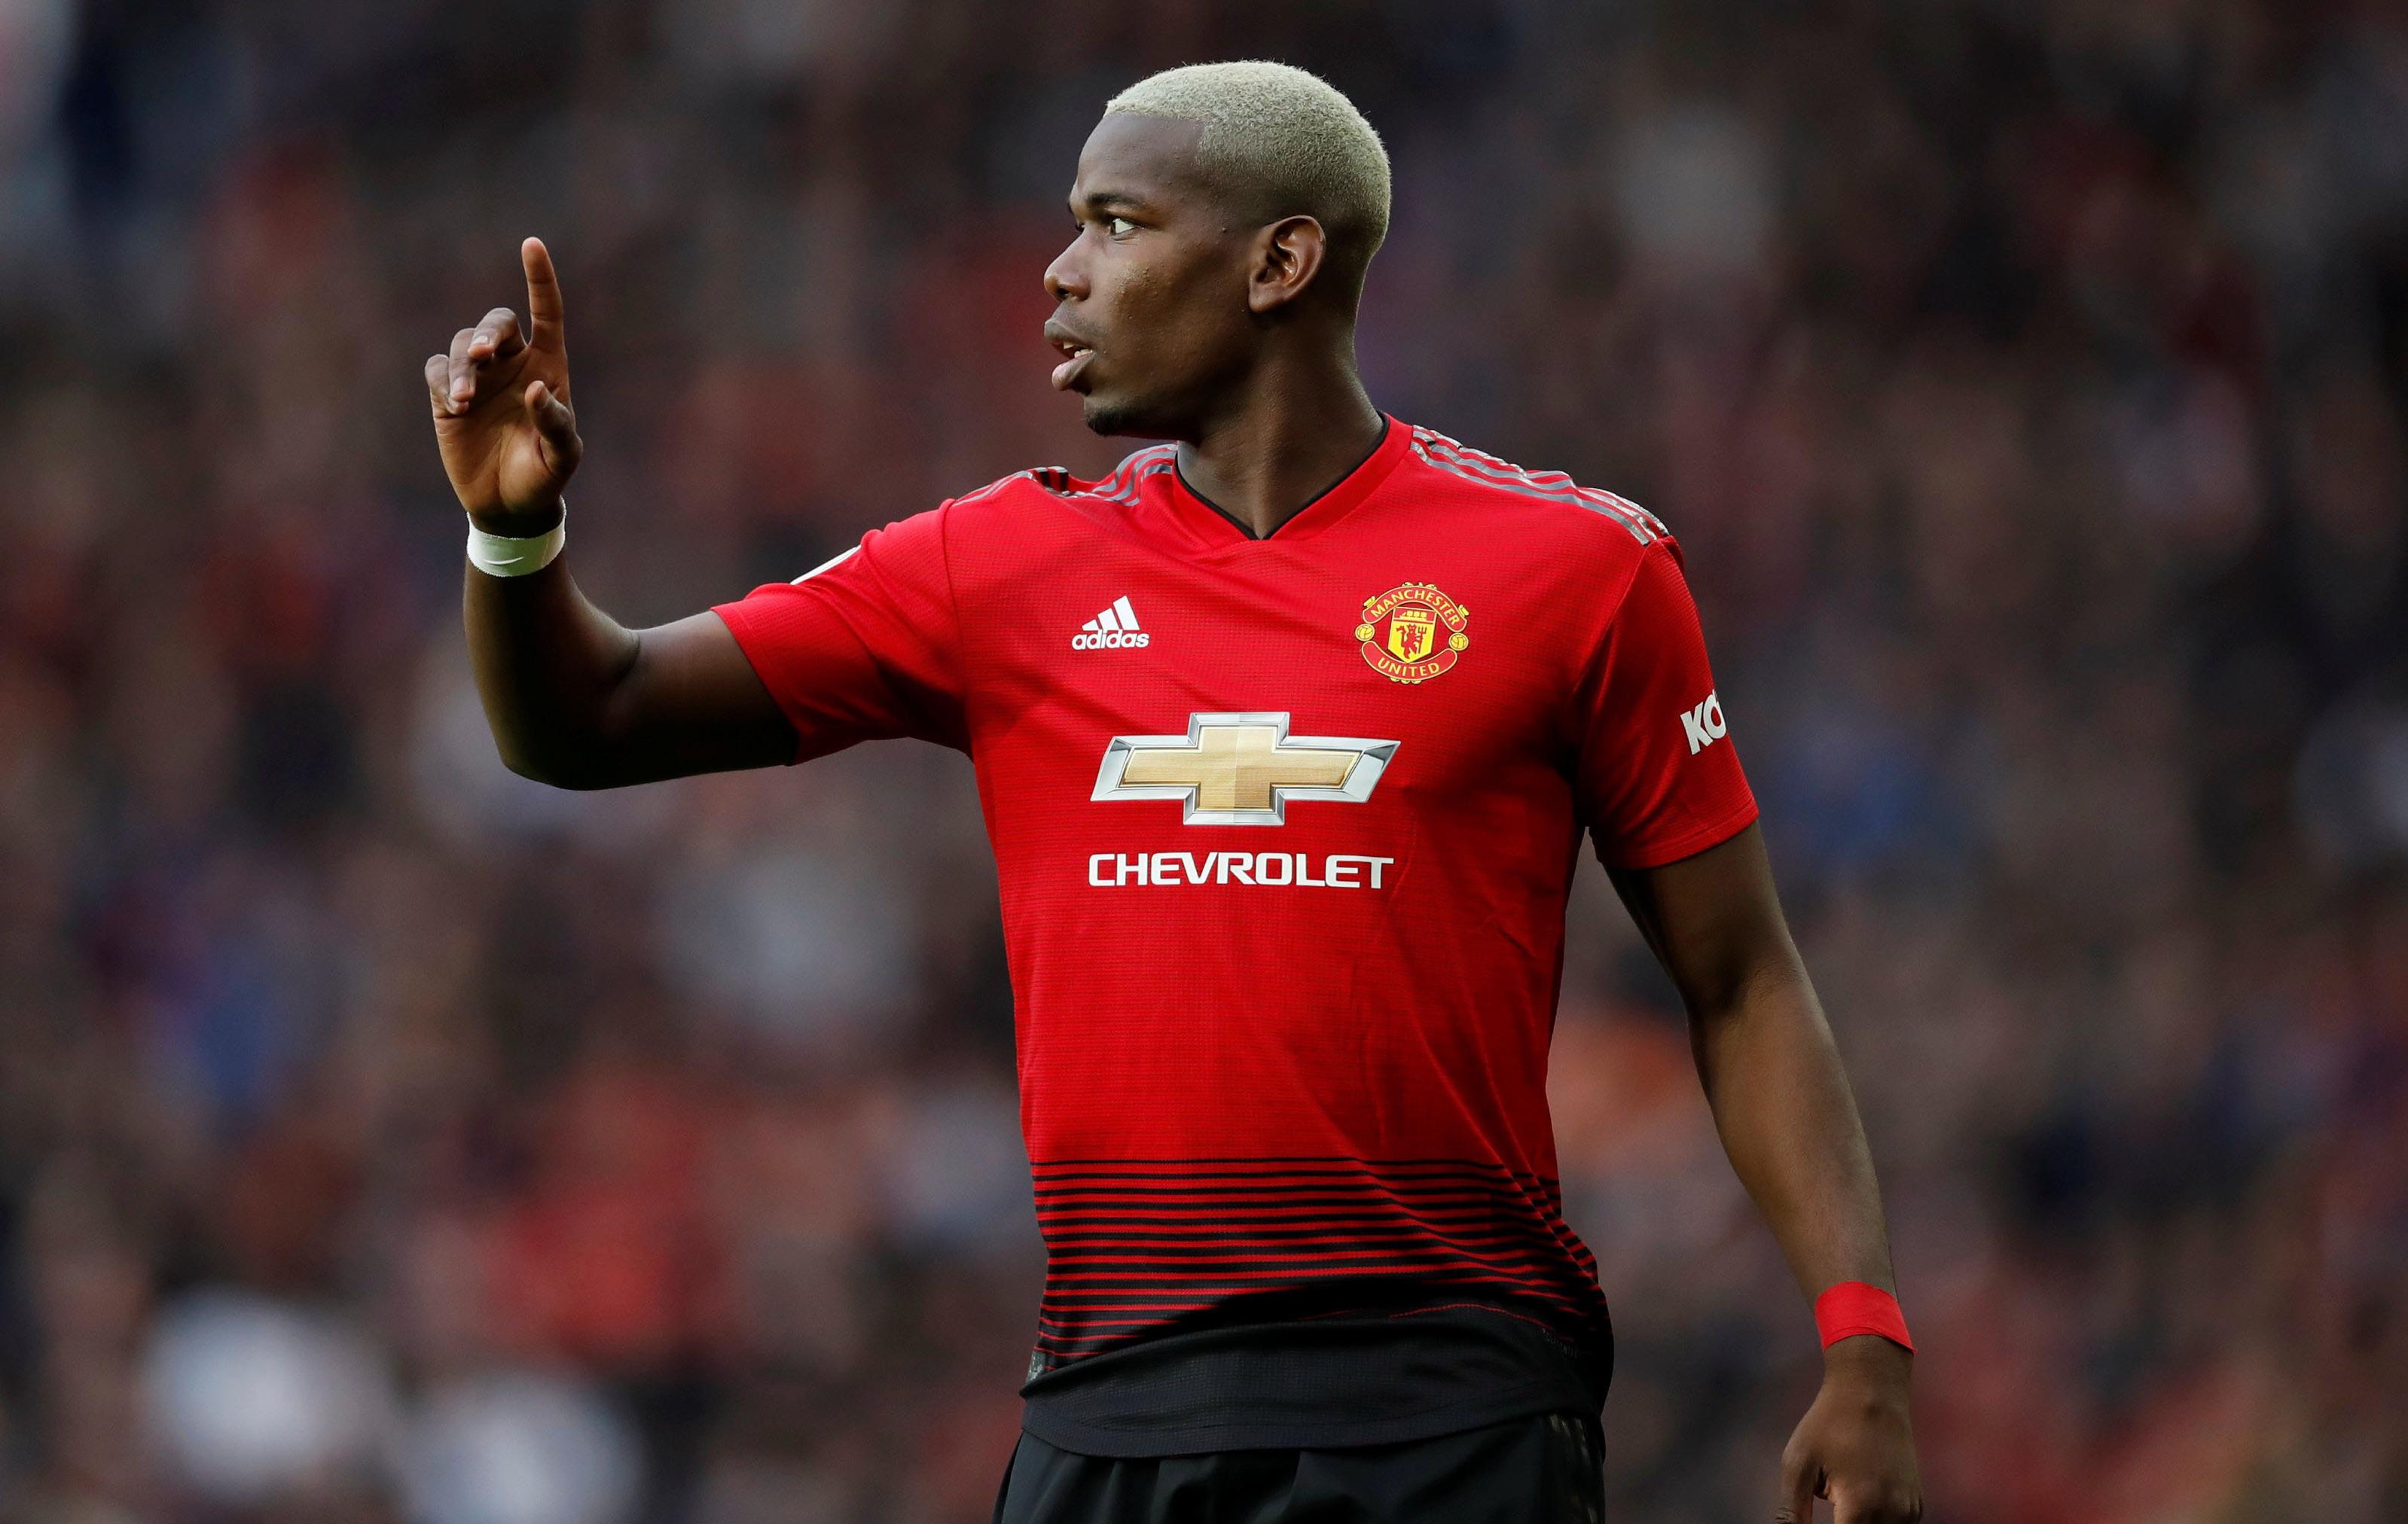 Football - Etranger - Premier League : Manchester United-Watford en direct